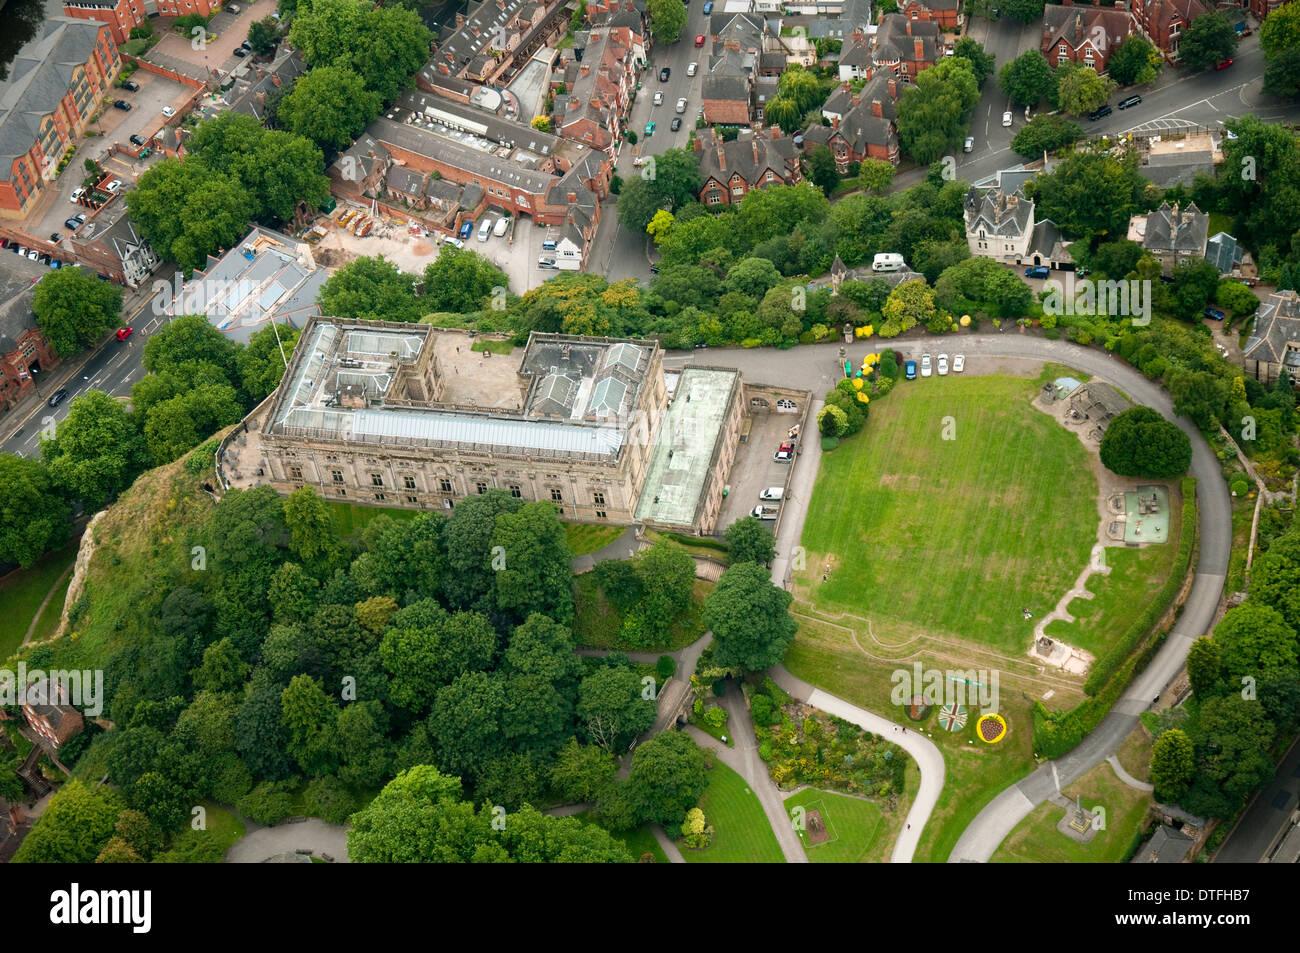 Aerial shot of Nottingham Castle and surrounding area, Nottingham Nottinghamshire UK - Stock Image